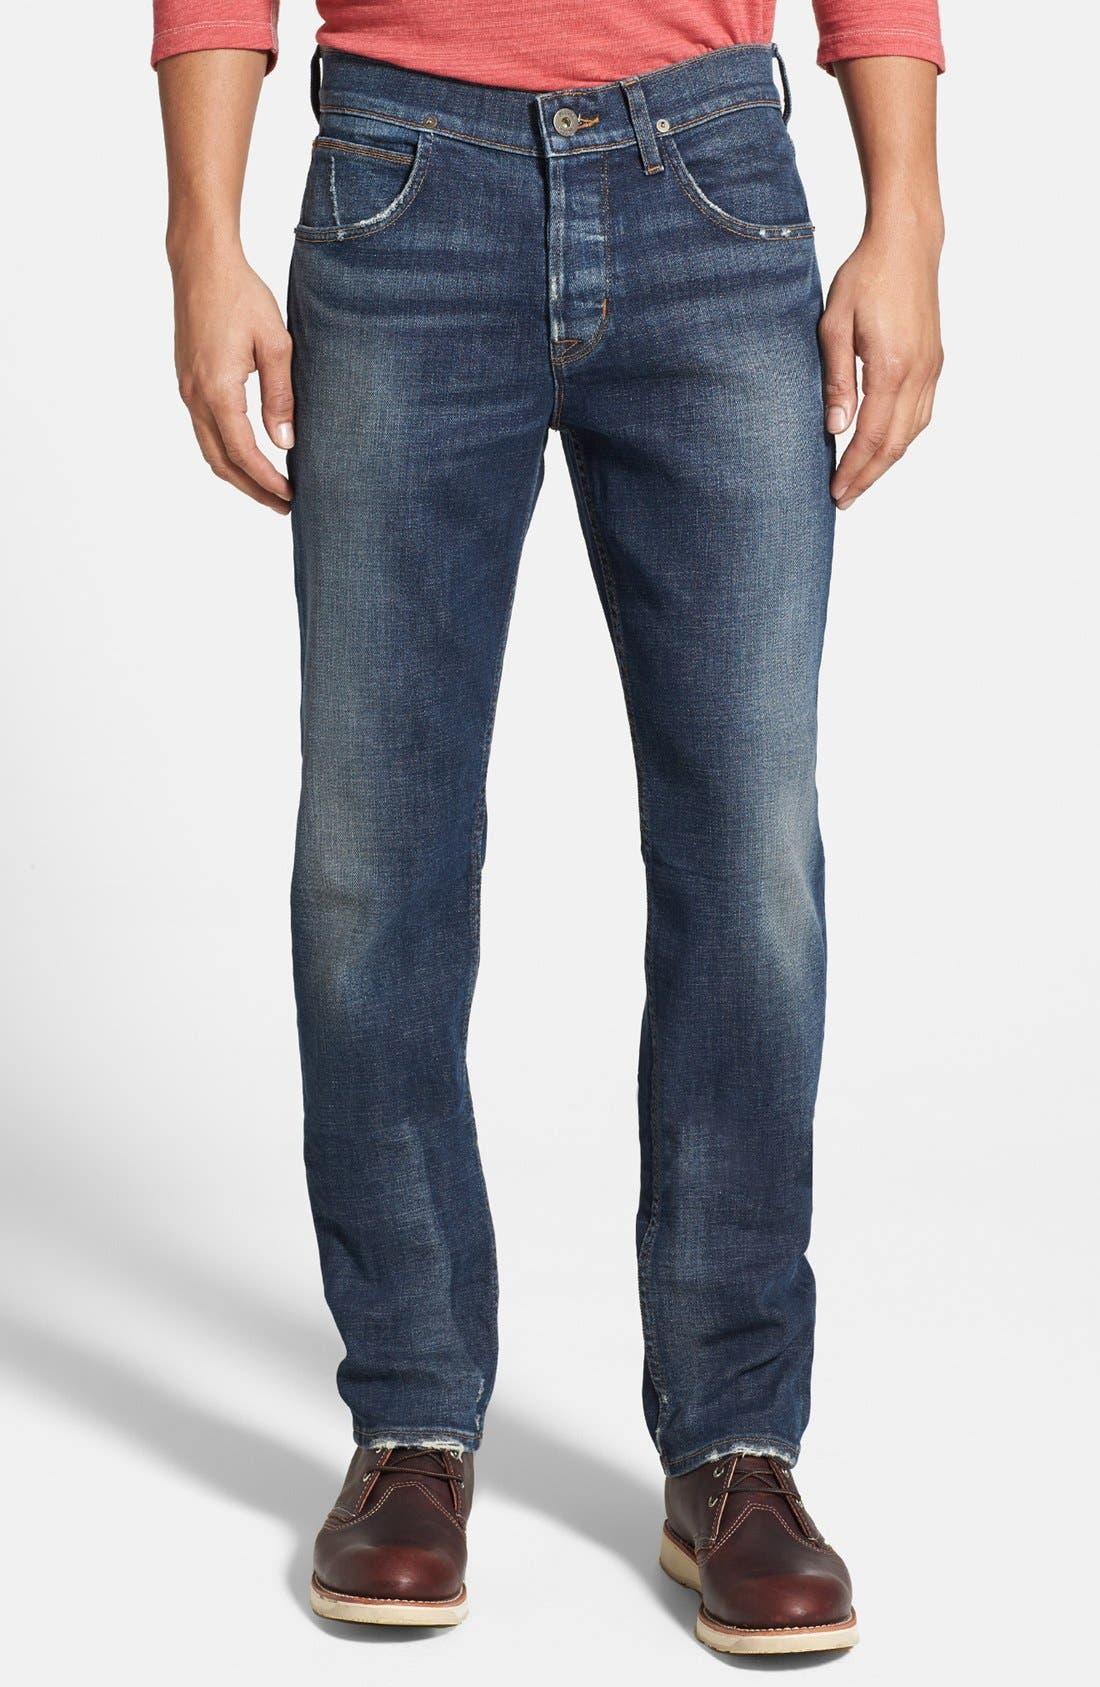 Alternate Image 1 Selected - Hudson Jeans 'Blake' Slim Straight Leg Jeans (Thieves)